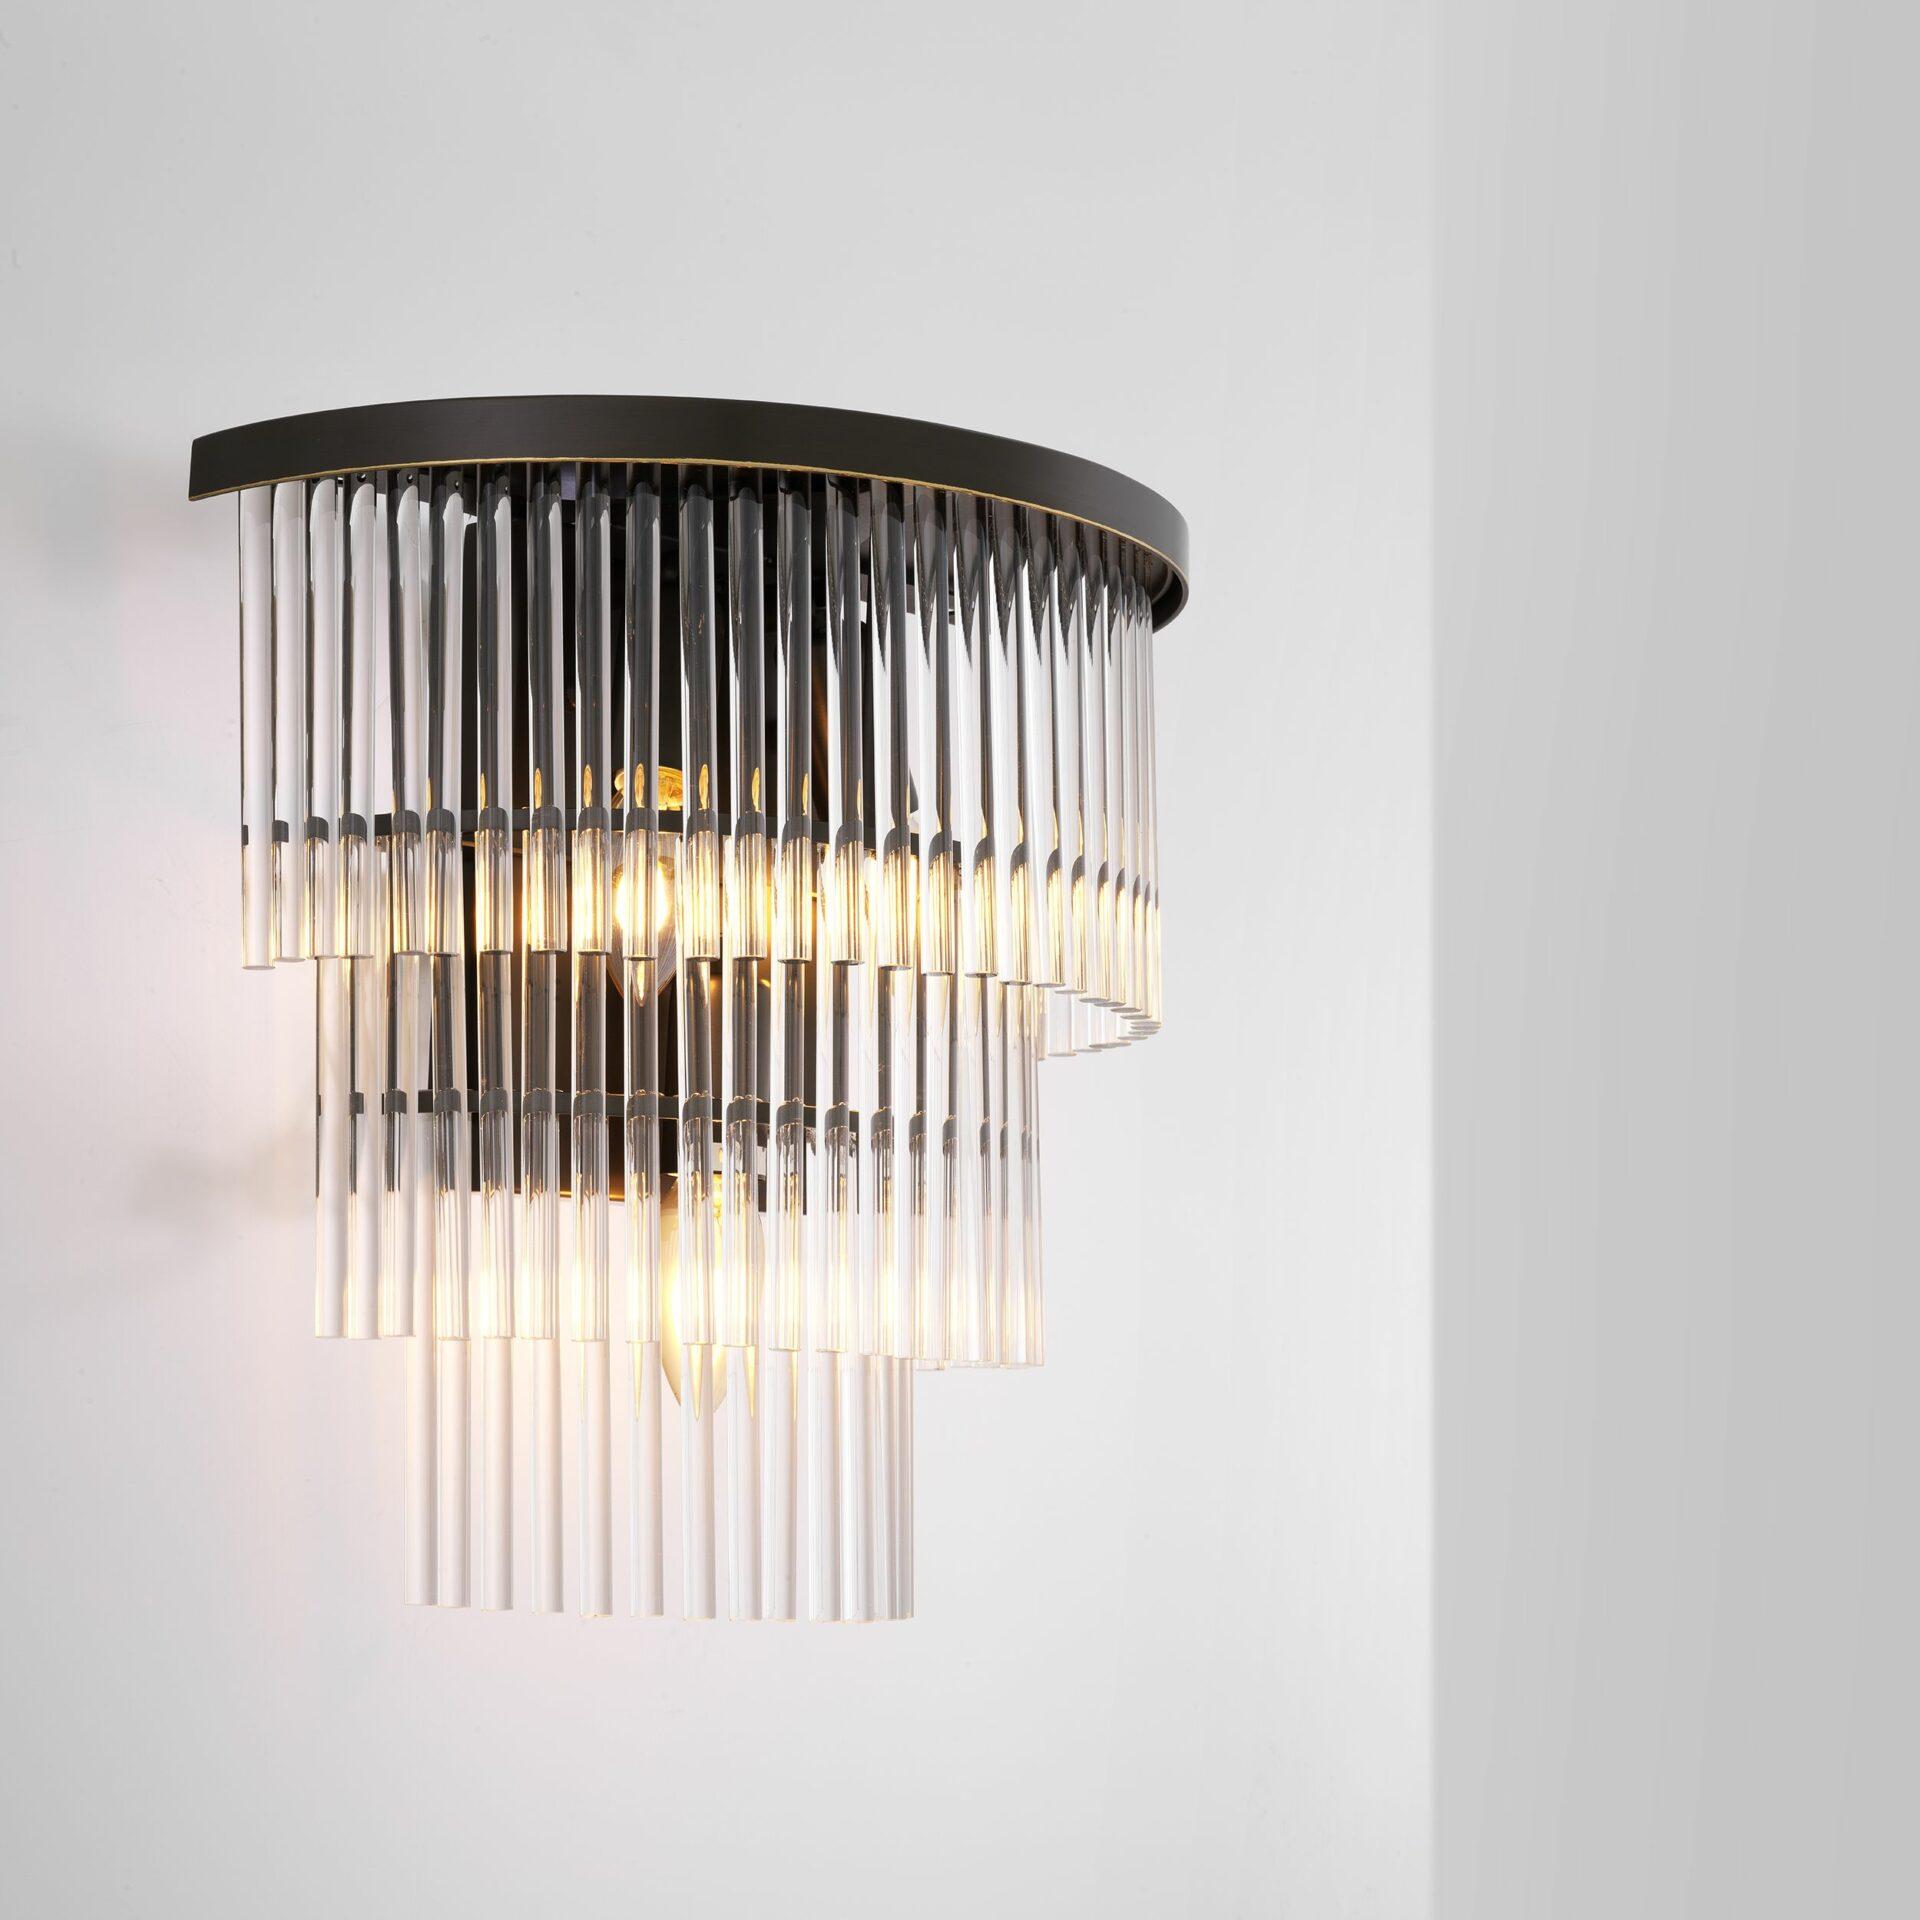 eichholtz-walllamp-east-bronze-1